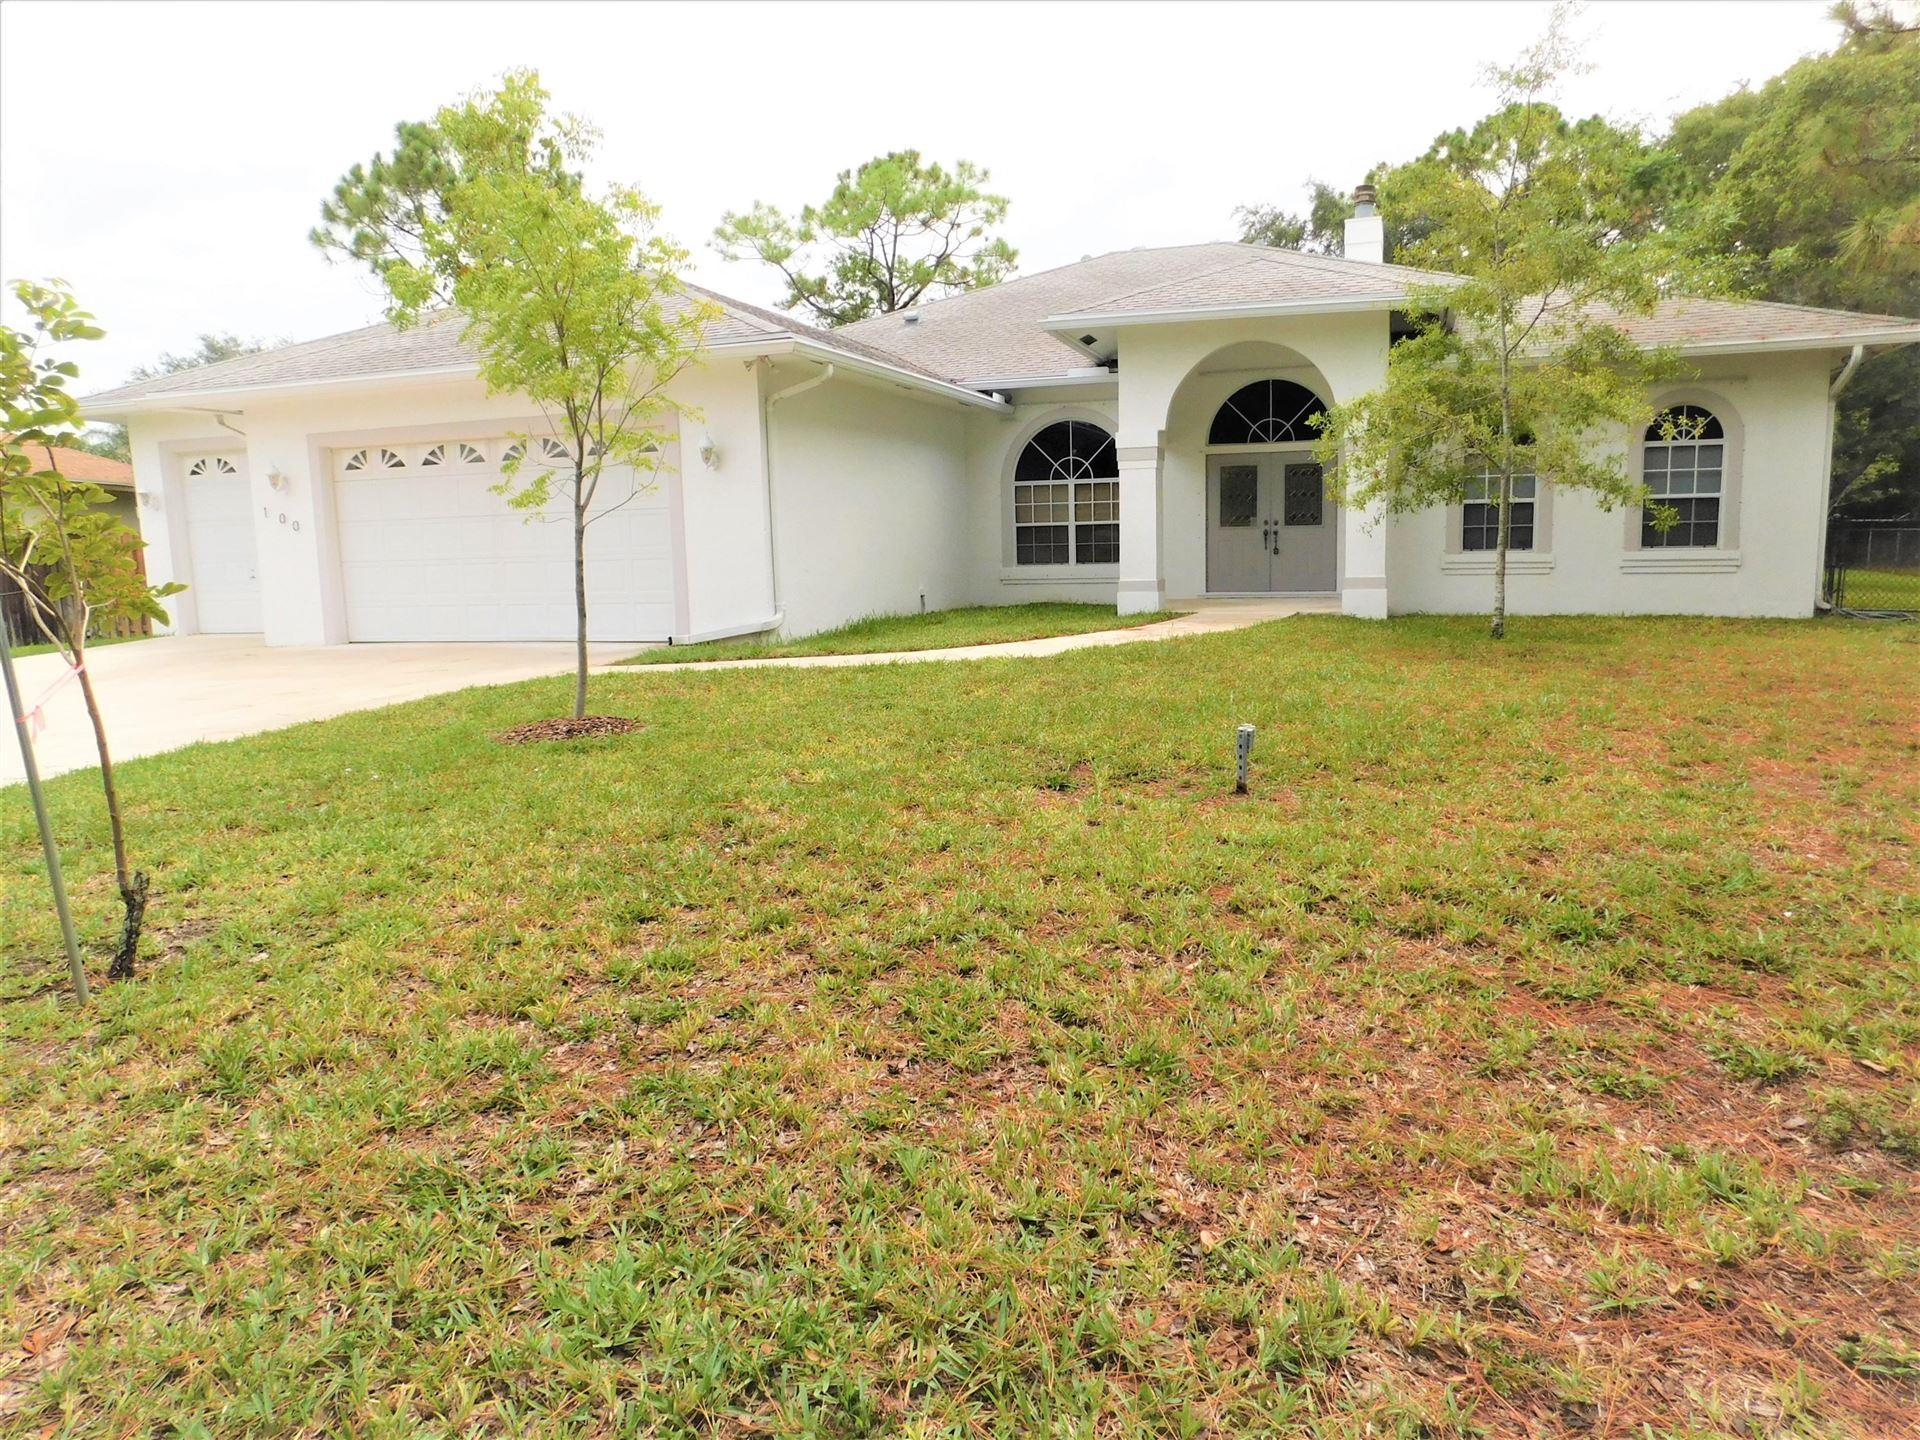 100 Emerald Court, Royal Palm Beach, FL 33411 - MLS#: RX-10725250